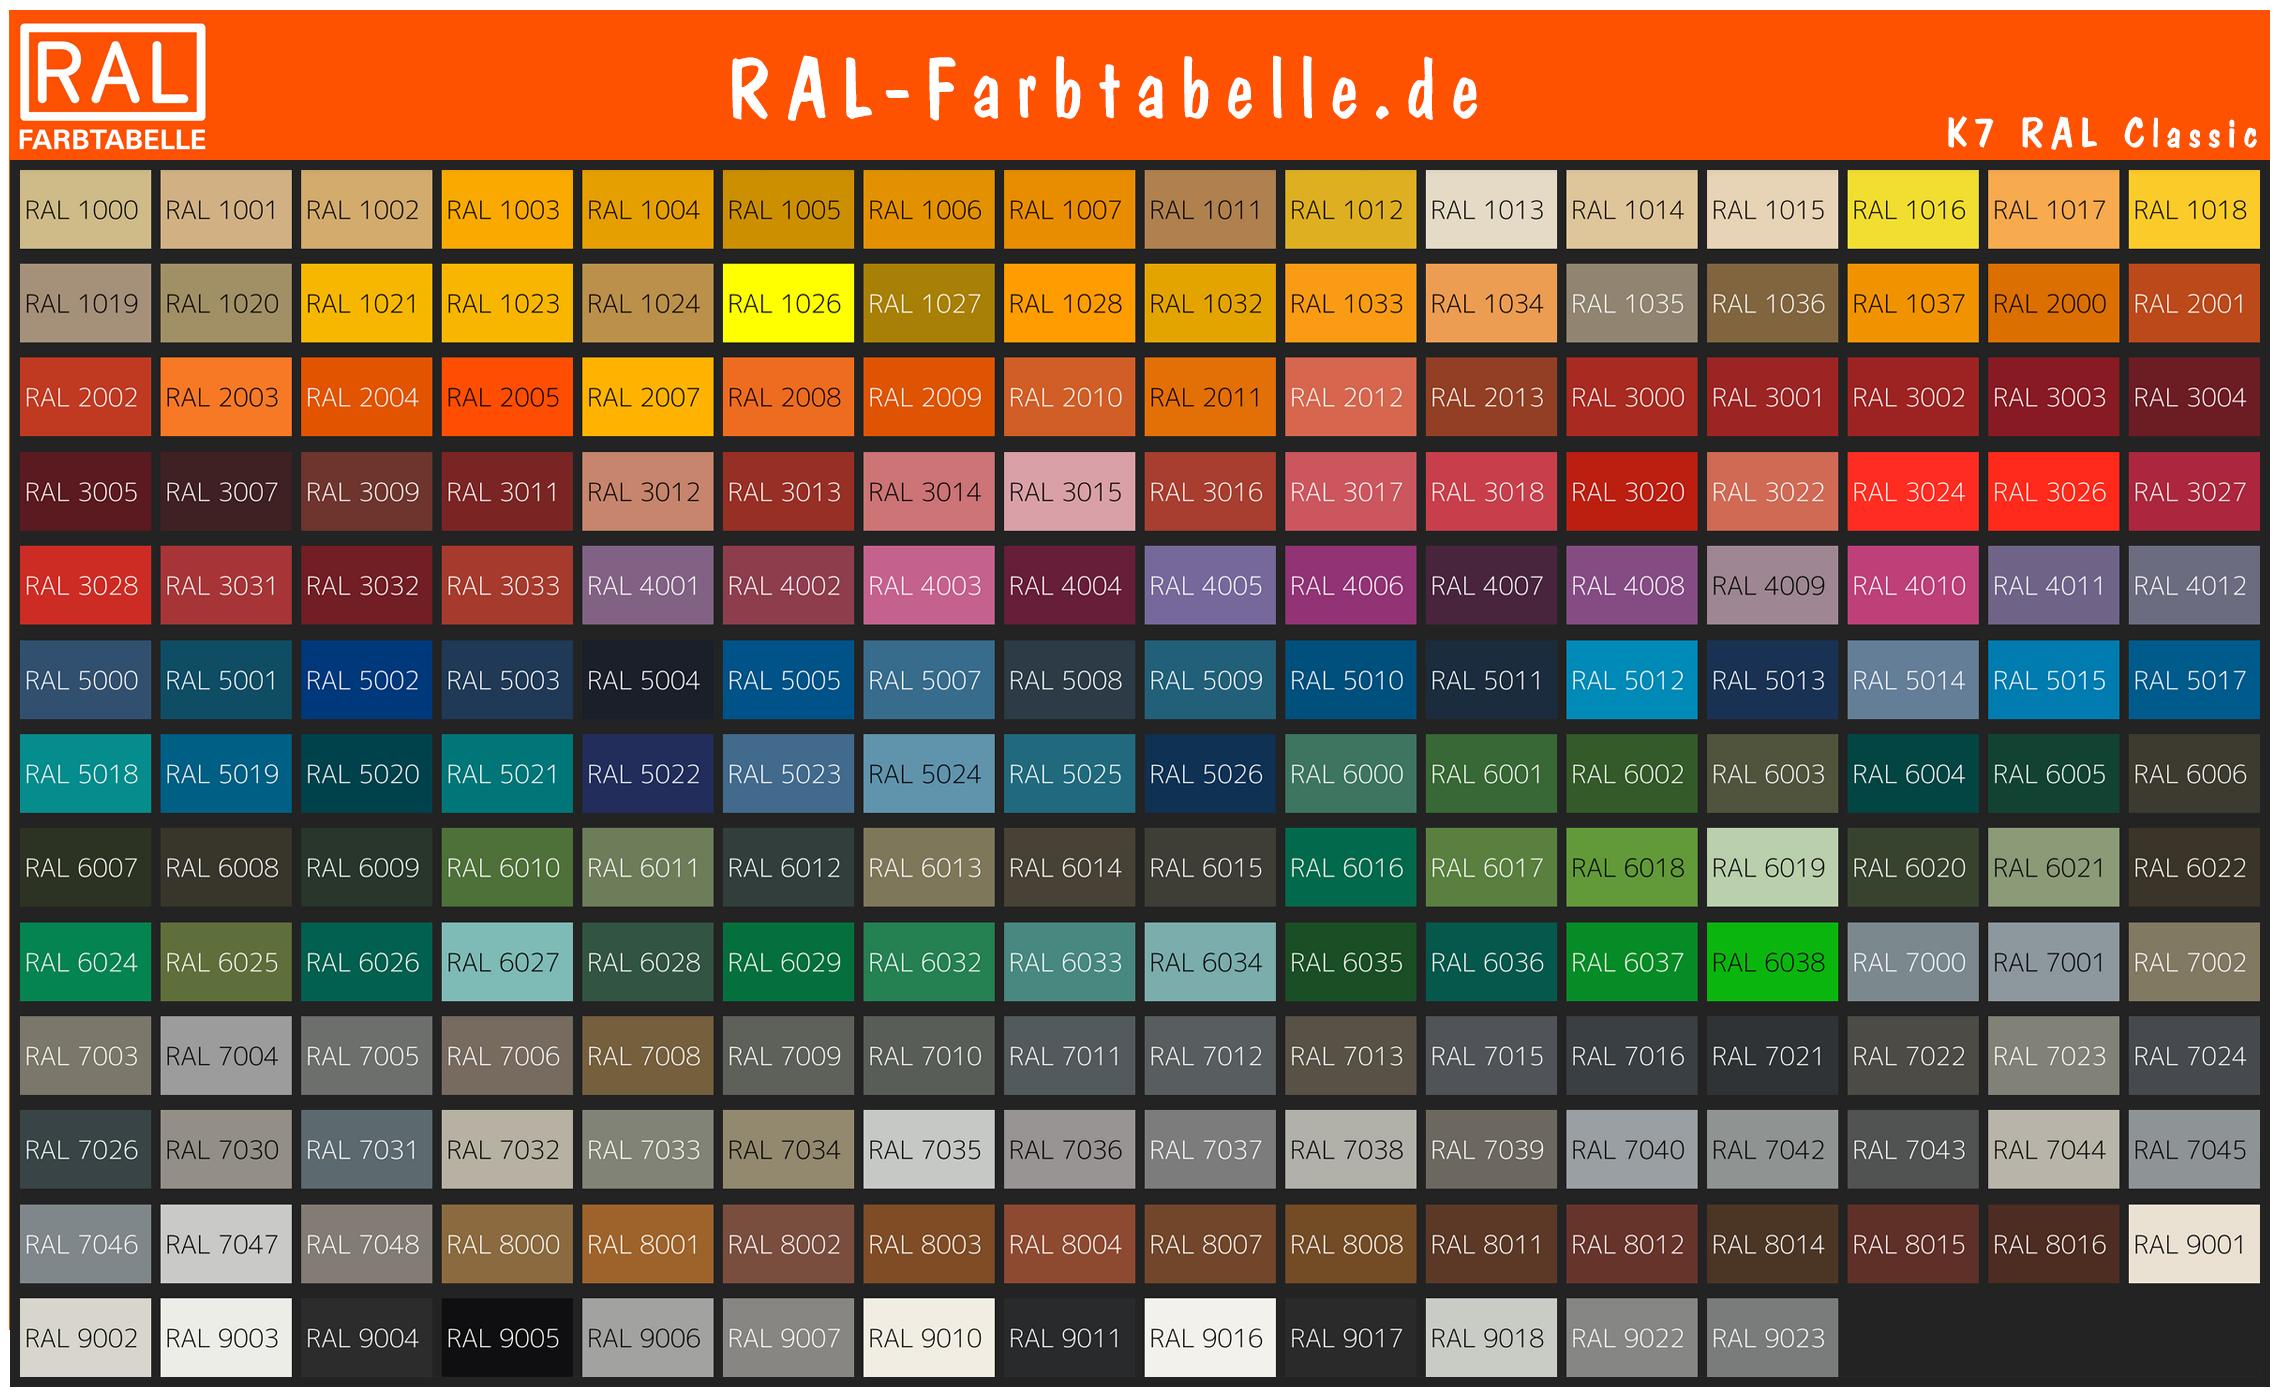 K7 RAL Classic Farbtabelle